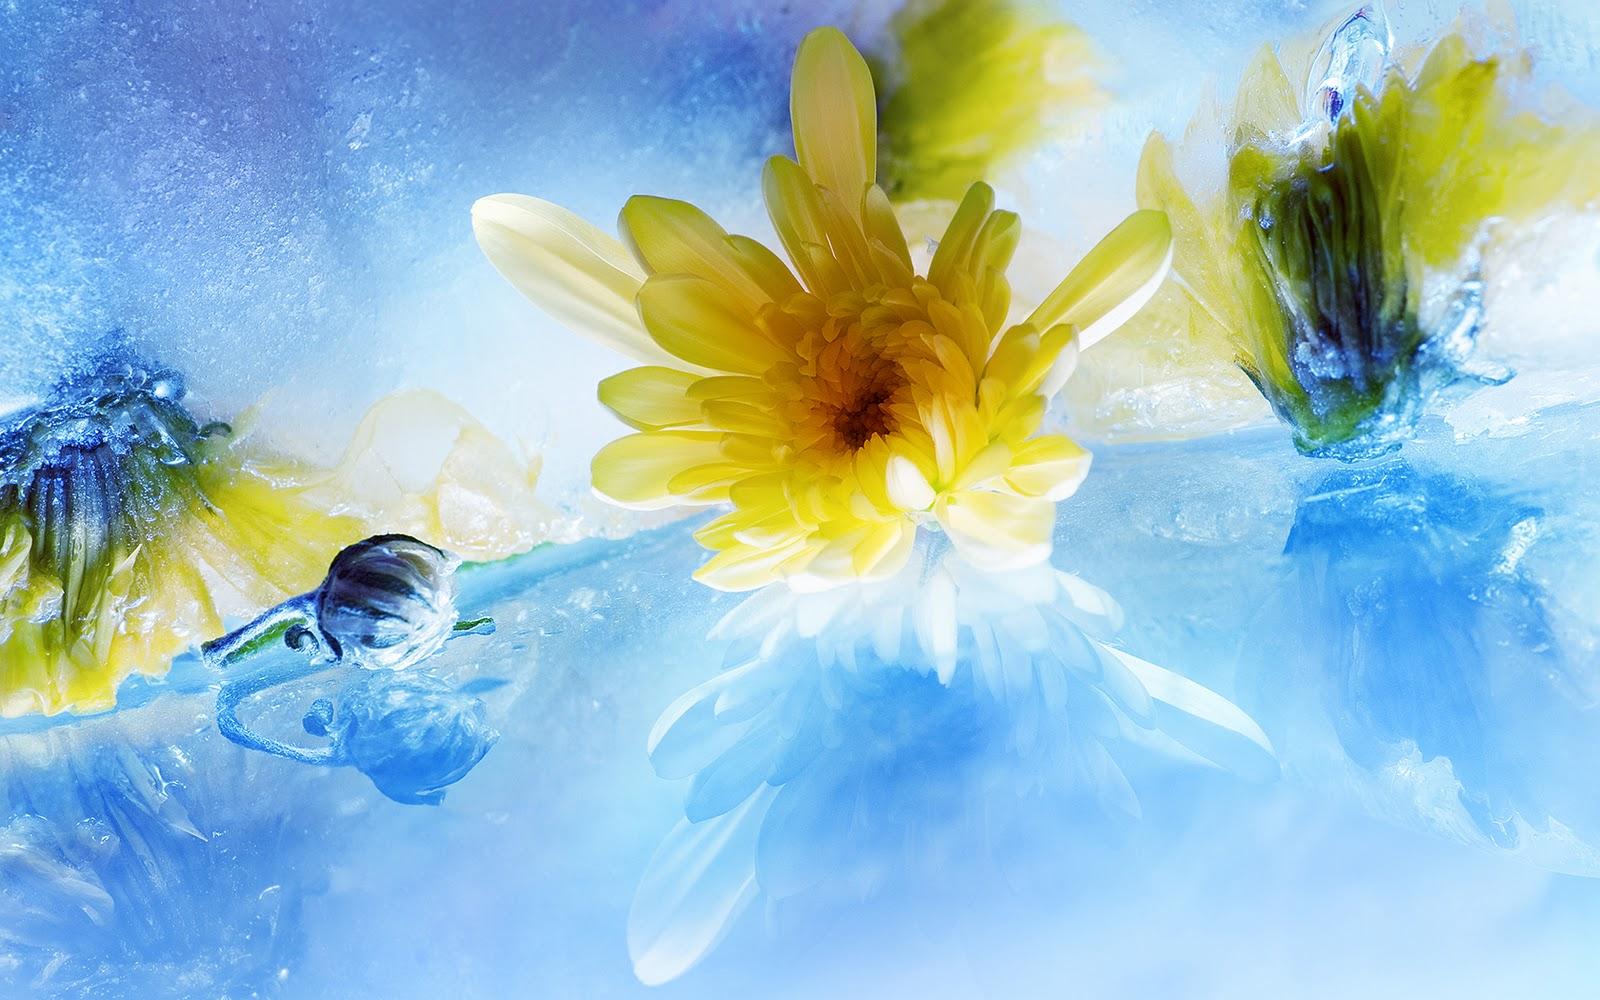 Pics photos hd wallpapers epic desktop s - Flowers Water Ice Amazing Hd Wallpapers Epic Desktop Backgrounds